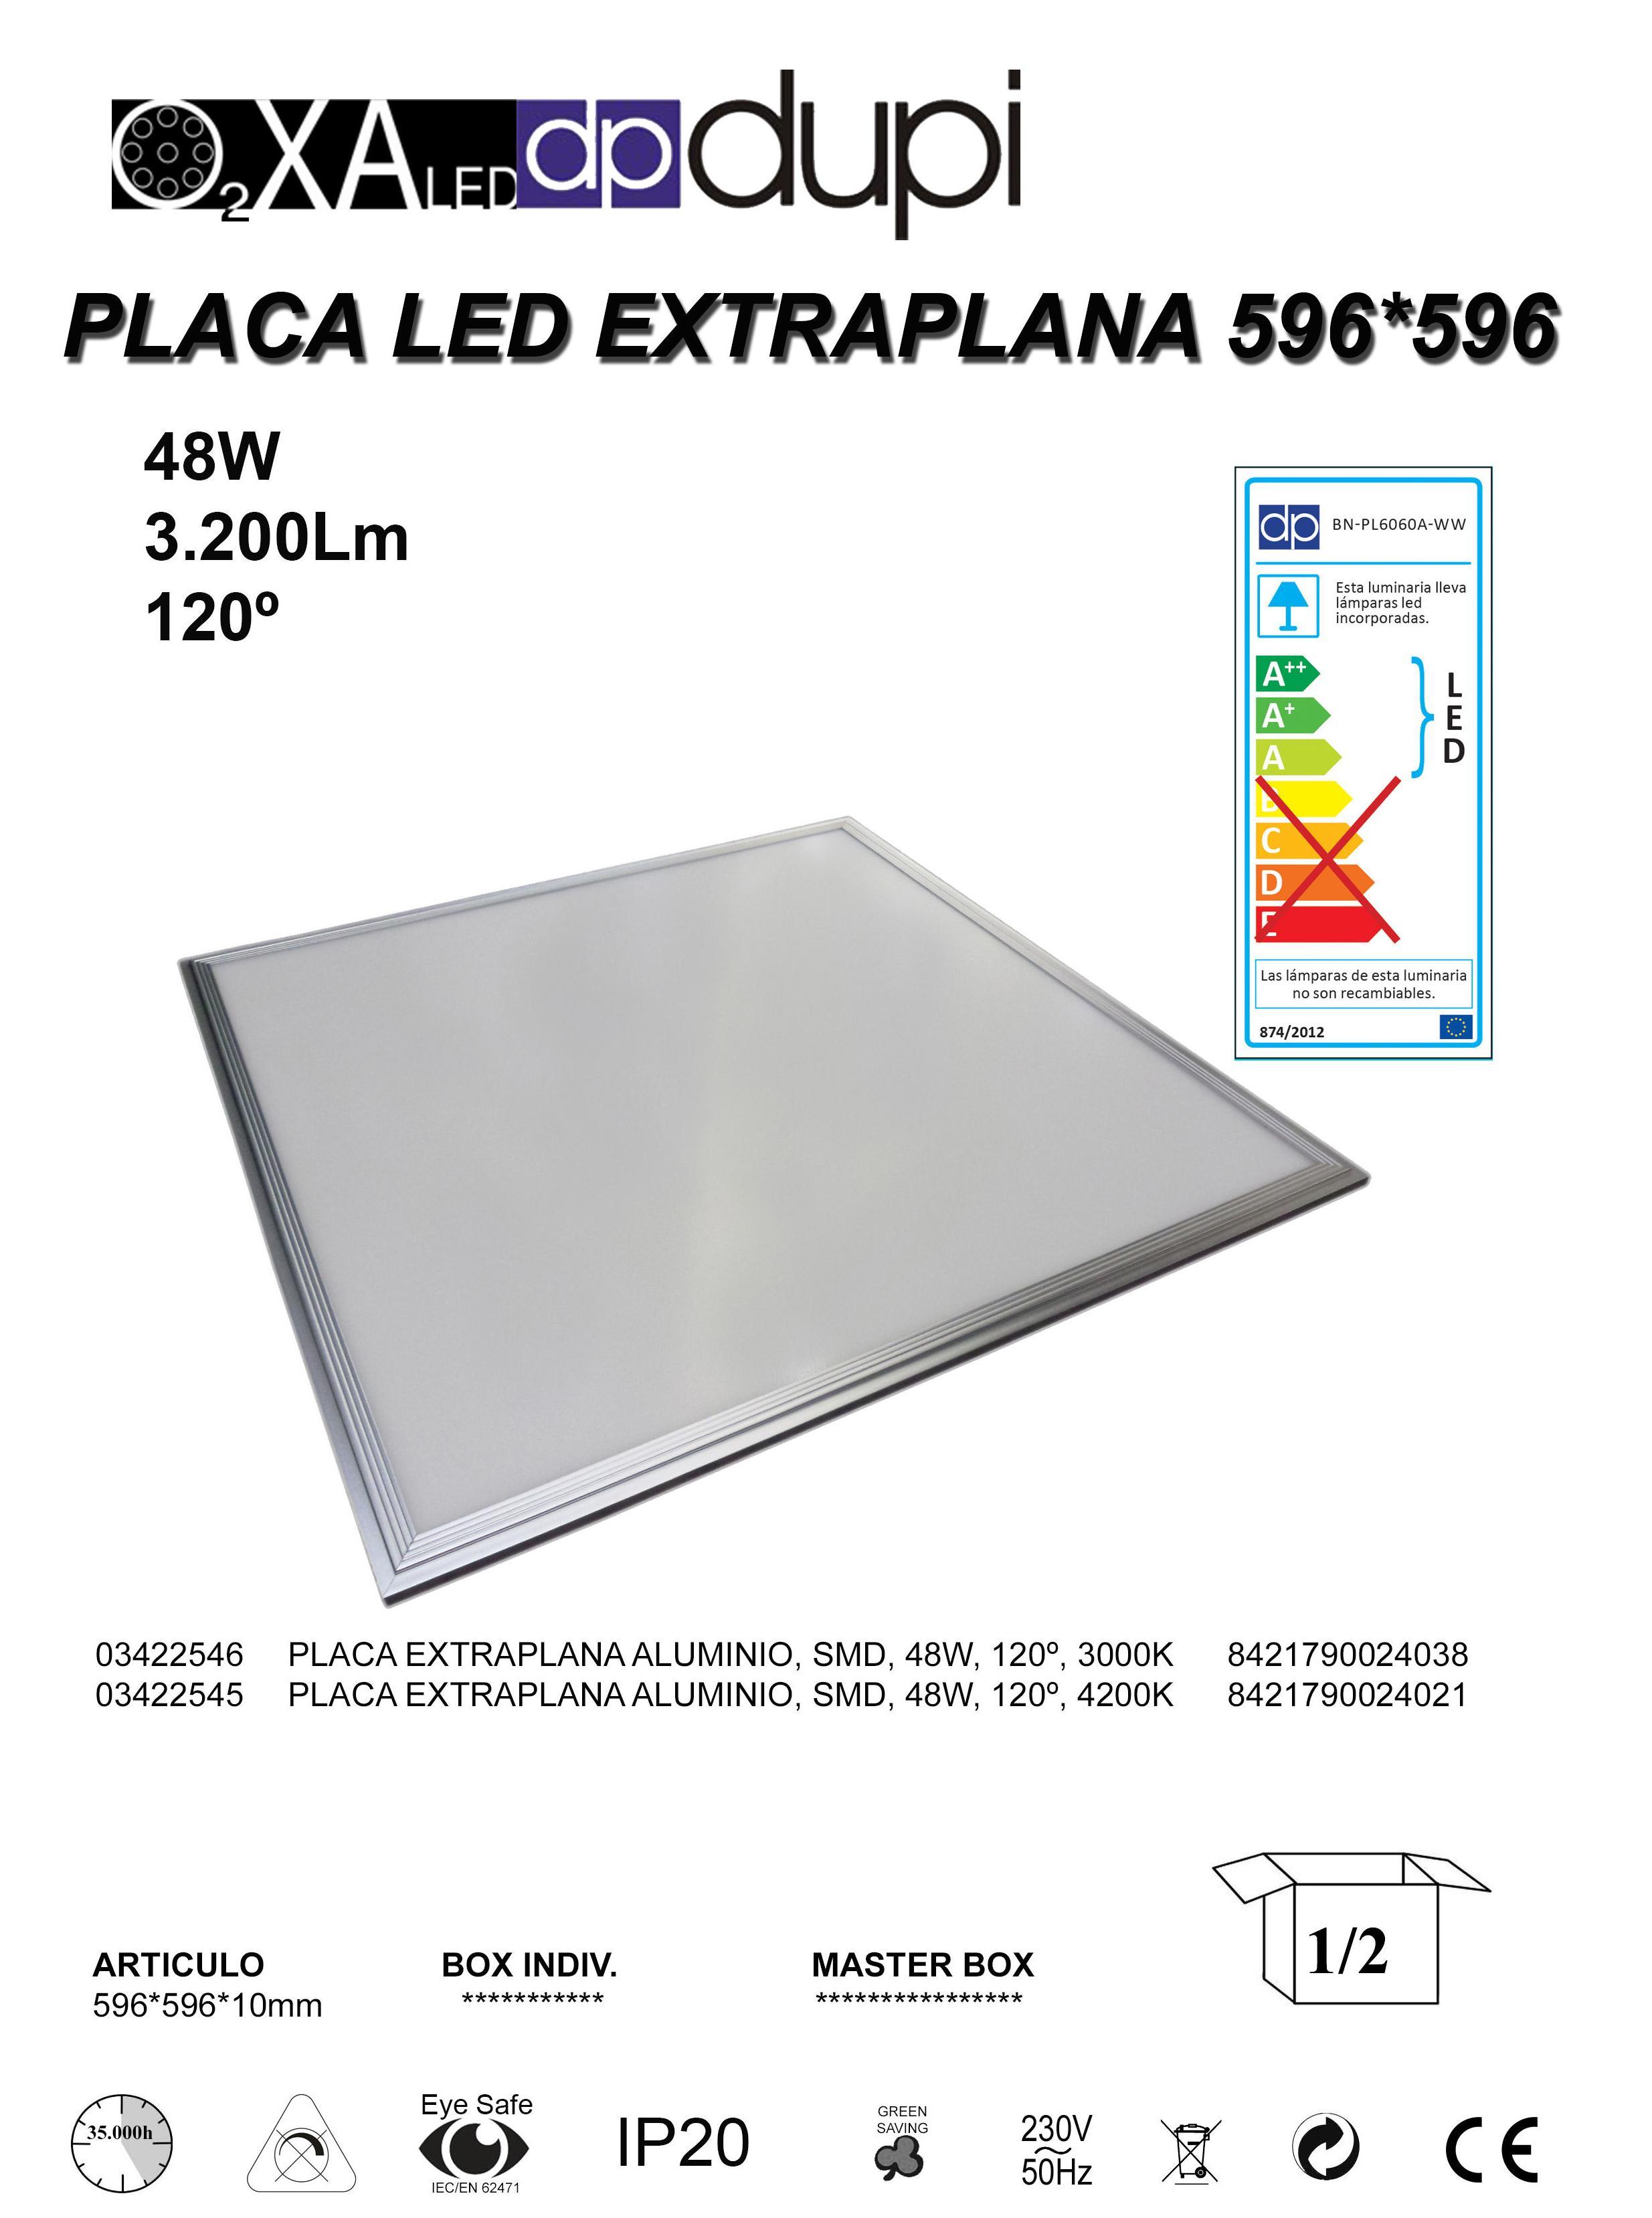 PANEL LED 48W montaje en techo desmontable.